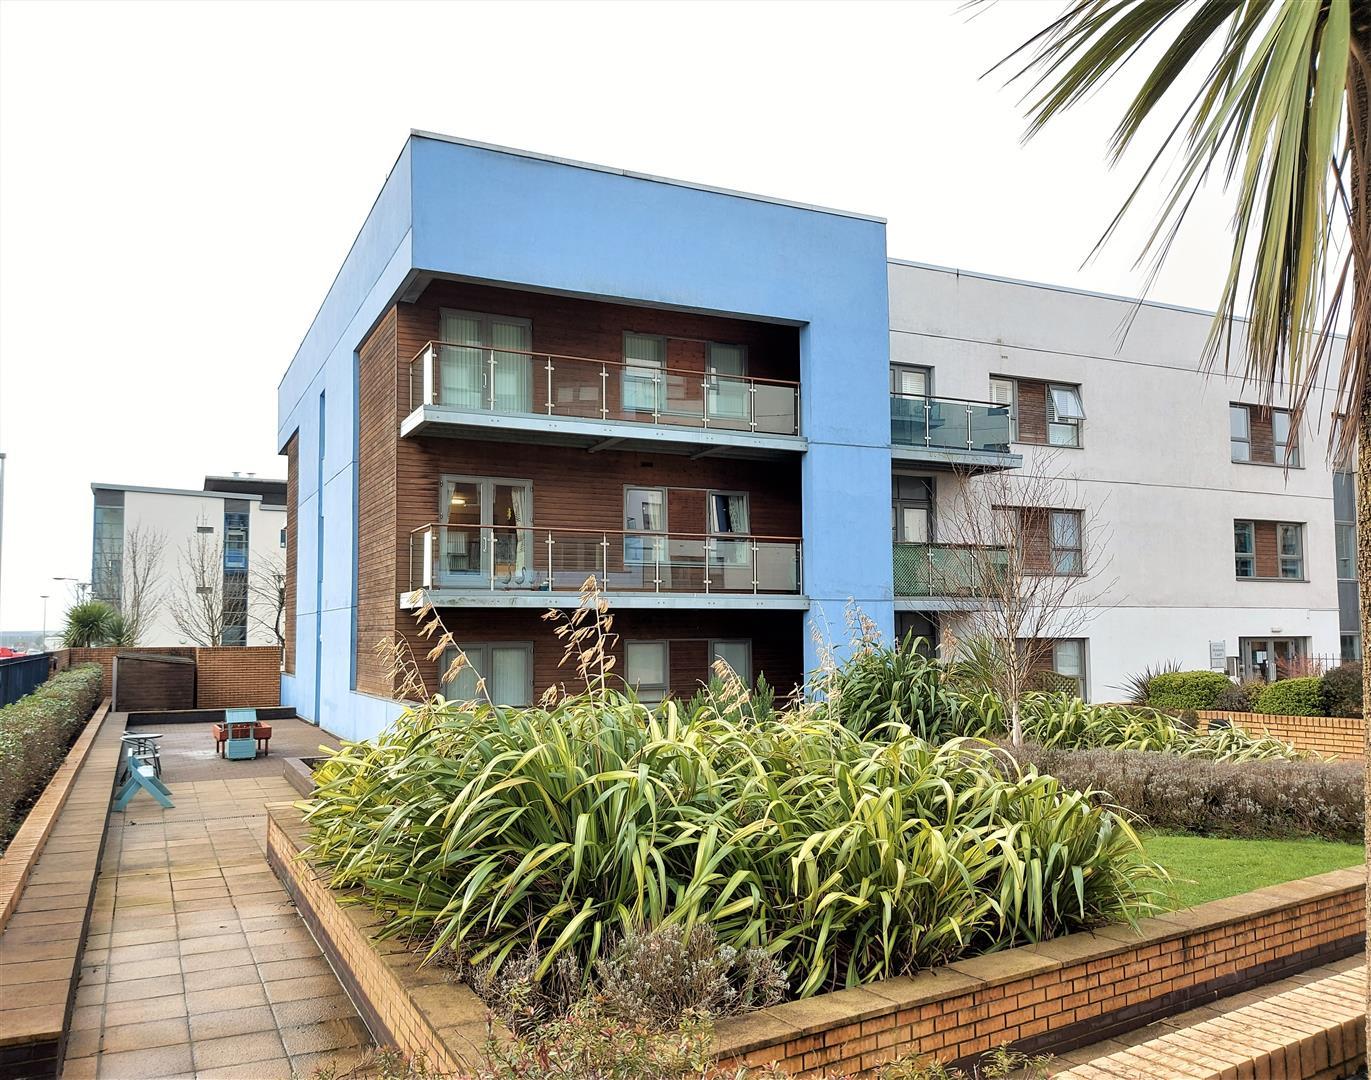 Mariners Court, Lamberts Road, Swansea, SA1 8QS